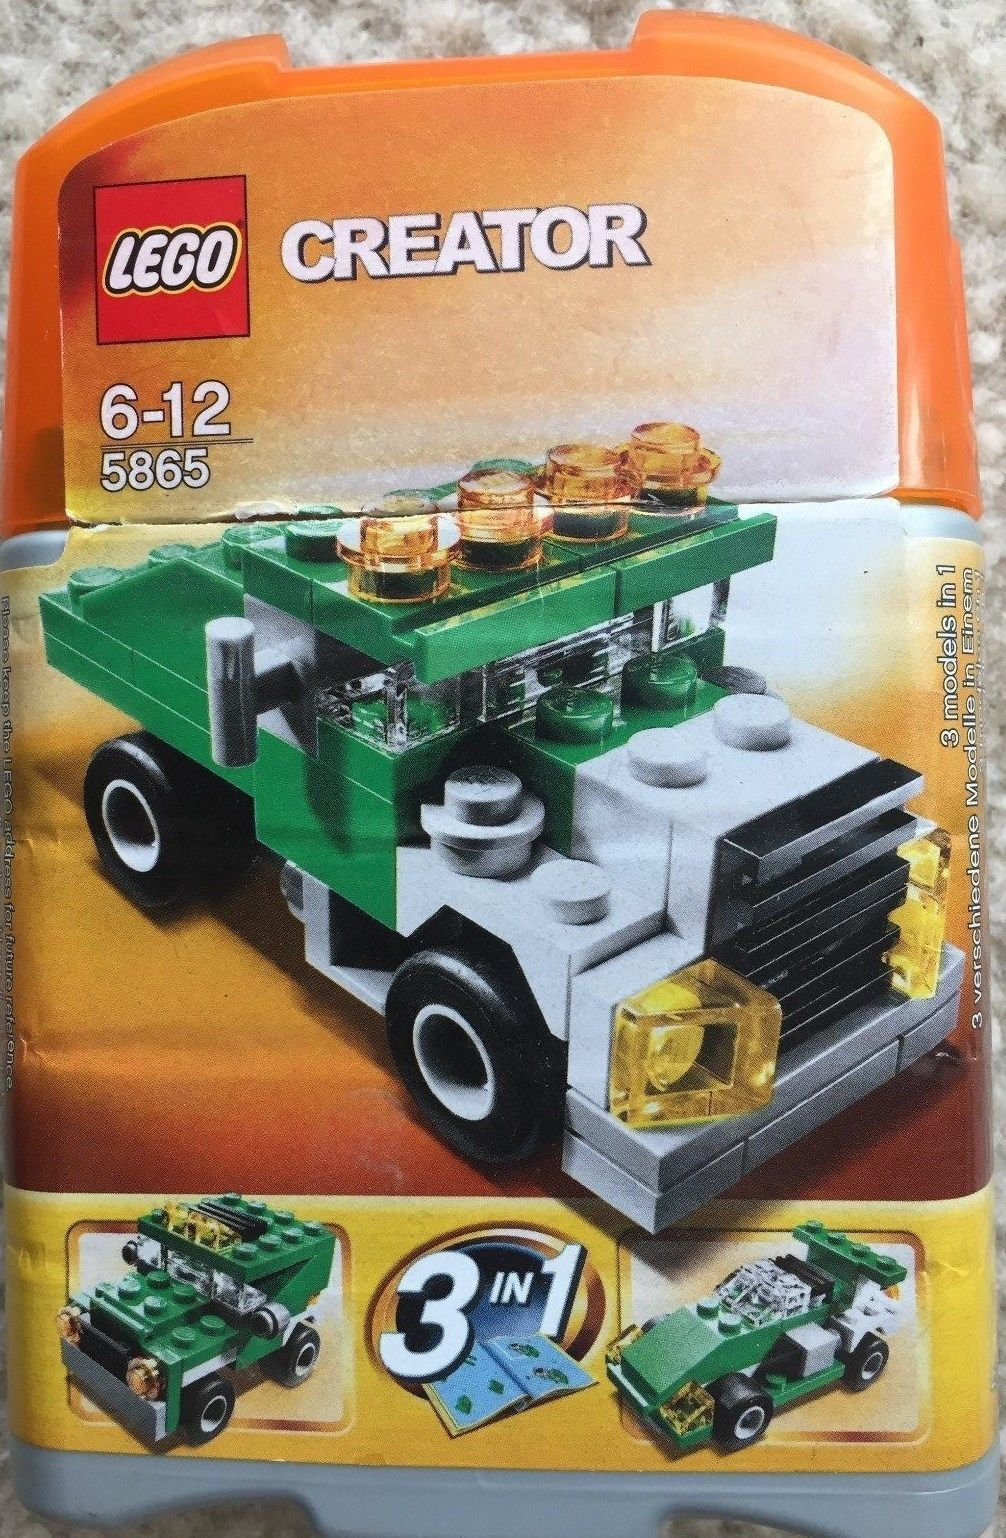 Car 3 toys  LEGO CREATOR  Mini Dumper  in  set complete  Buying Toys